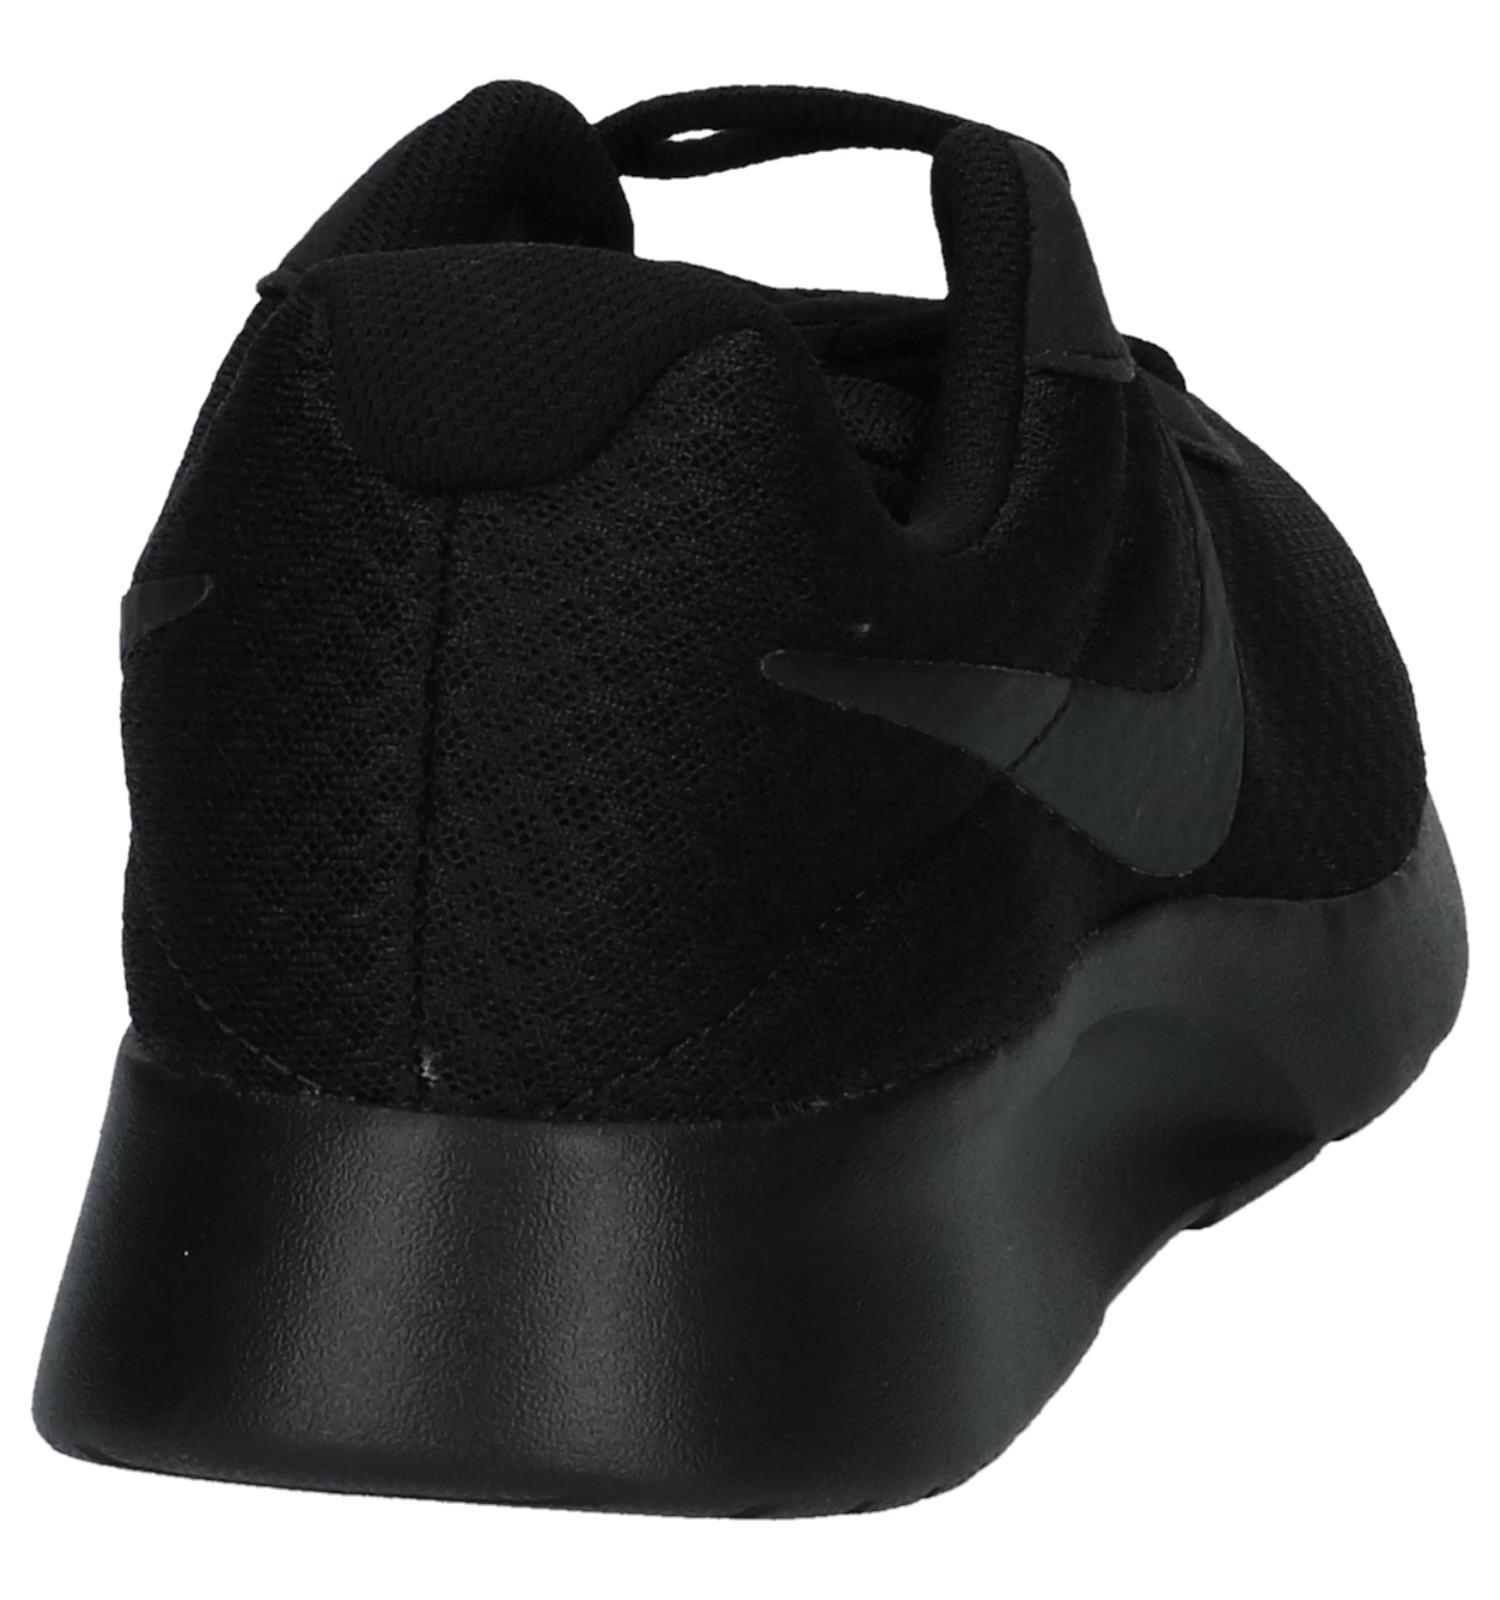 cf842b4f714 Zwarte Lichtgewicht Sneakers Nike Tanjun | TORFS.BE | Gratis verzend en  retour